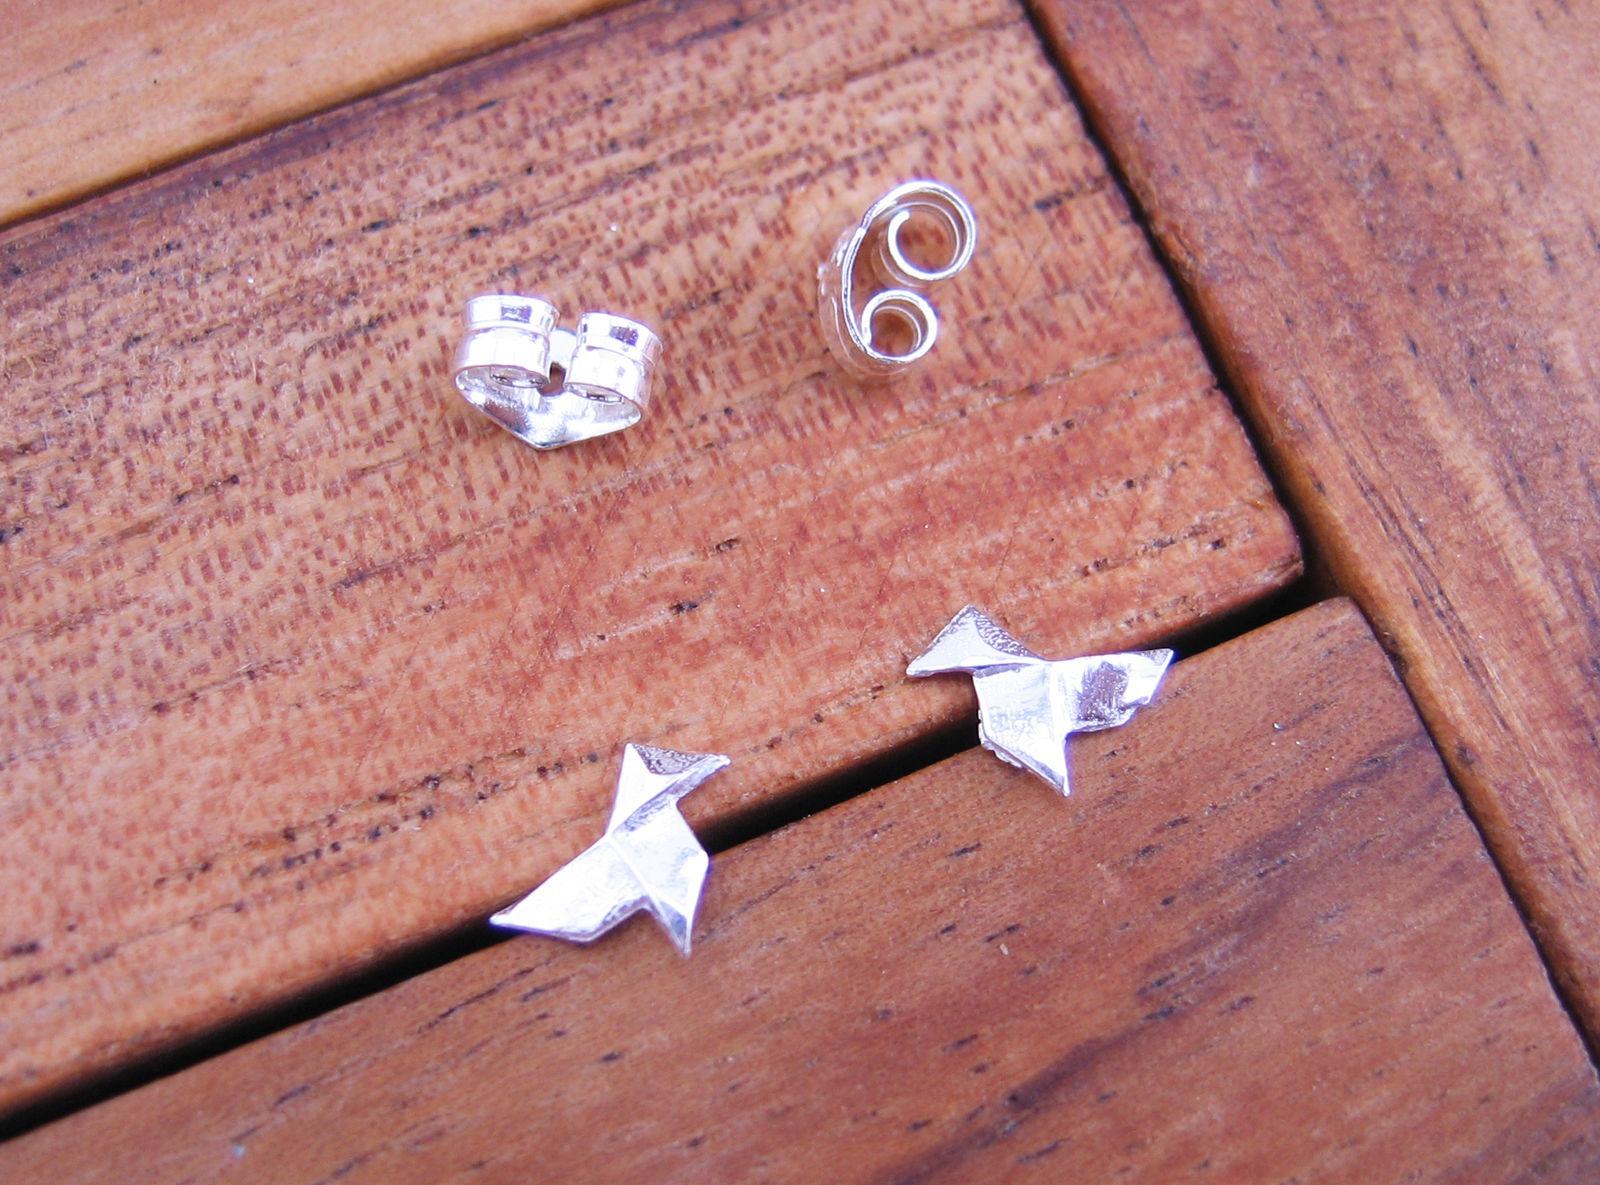 Boutique en ligne 4e2c7 447c9 Pendientes Pajarita Pequenos de Plata de Ley 925 ml (origami)